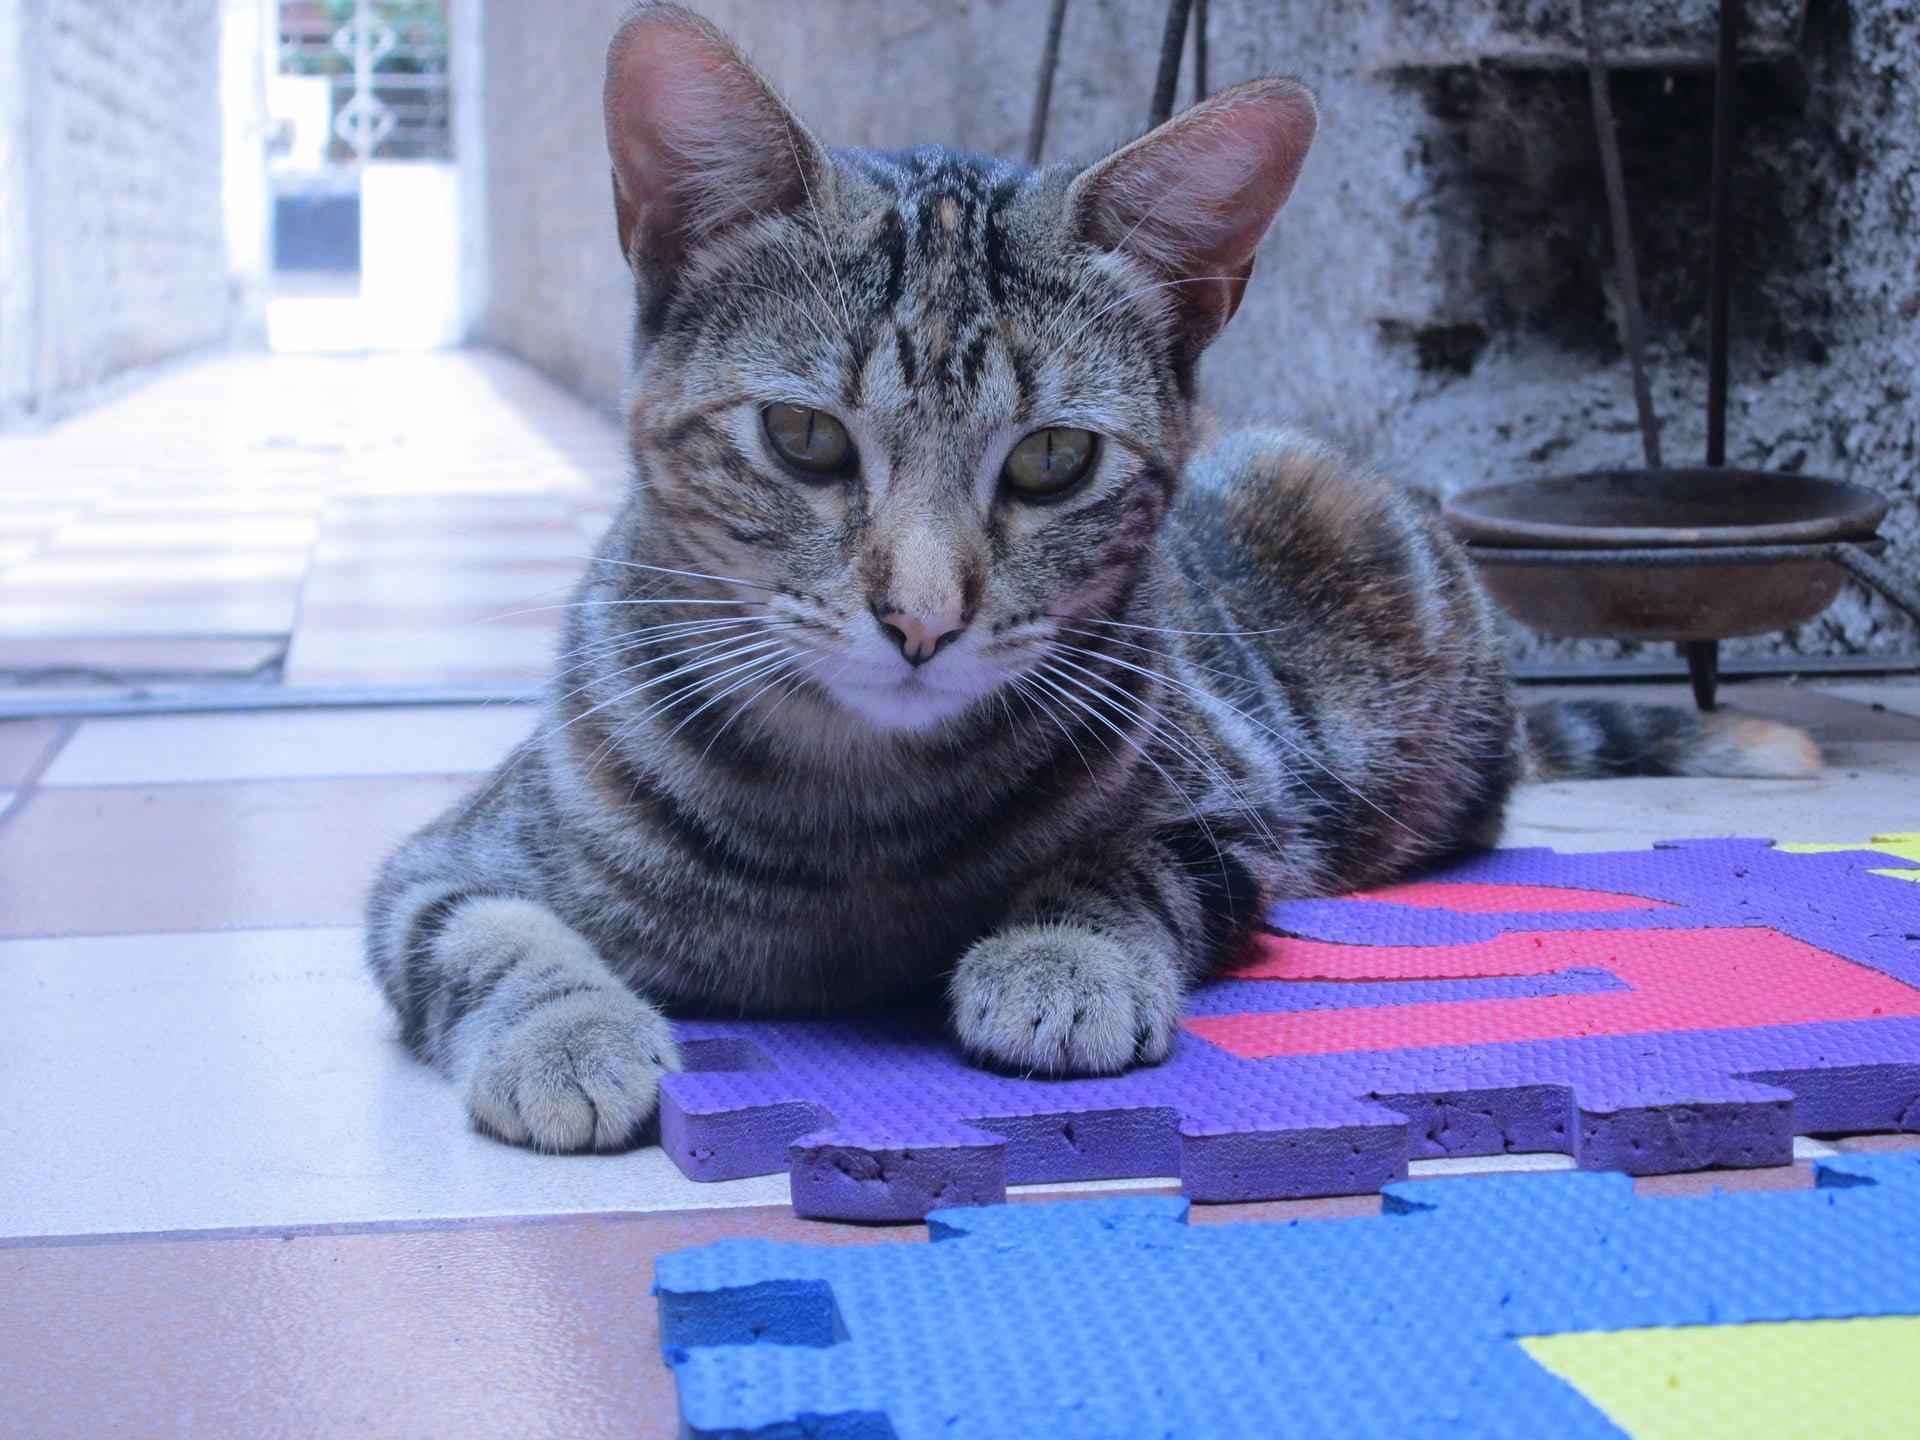 animal cat plastic mats in Room 塑膠地墊可以資源回收清運嗎?